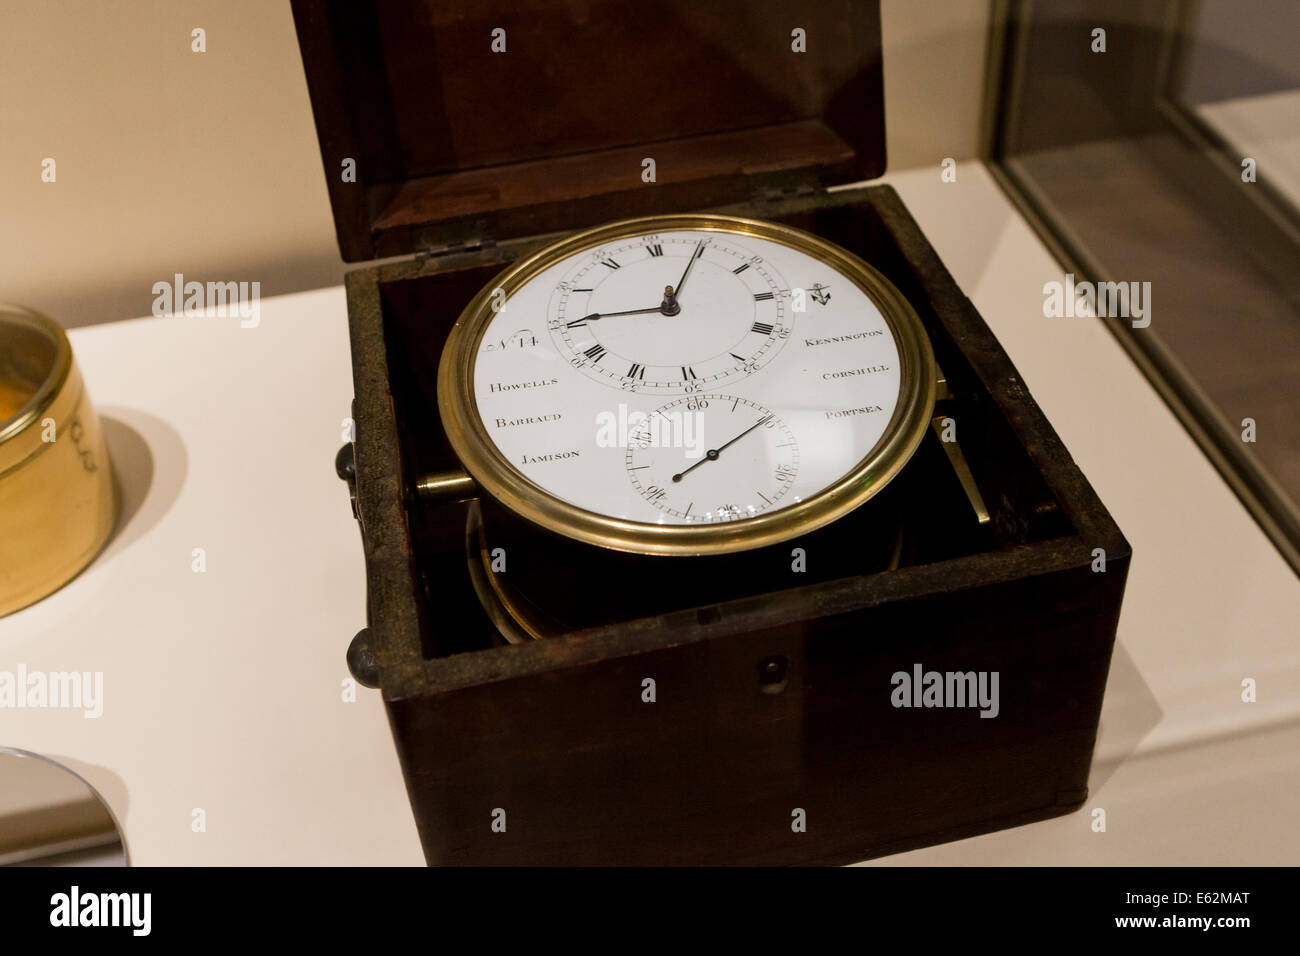 Thomas Mudge Marine Chronometer, 1802 - National Air and Space Museum, Washington, DC USA - Stock Image